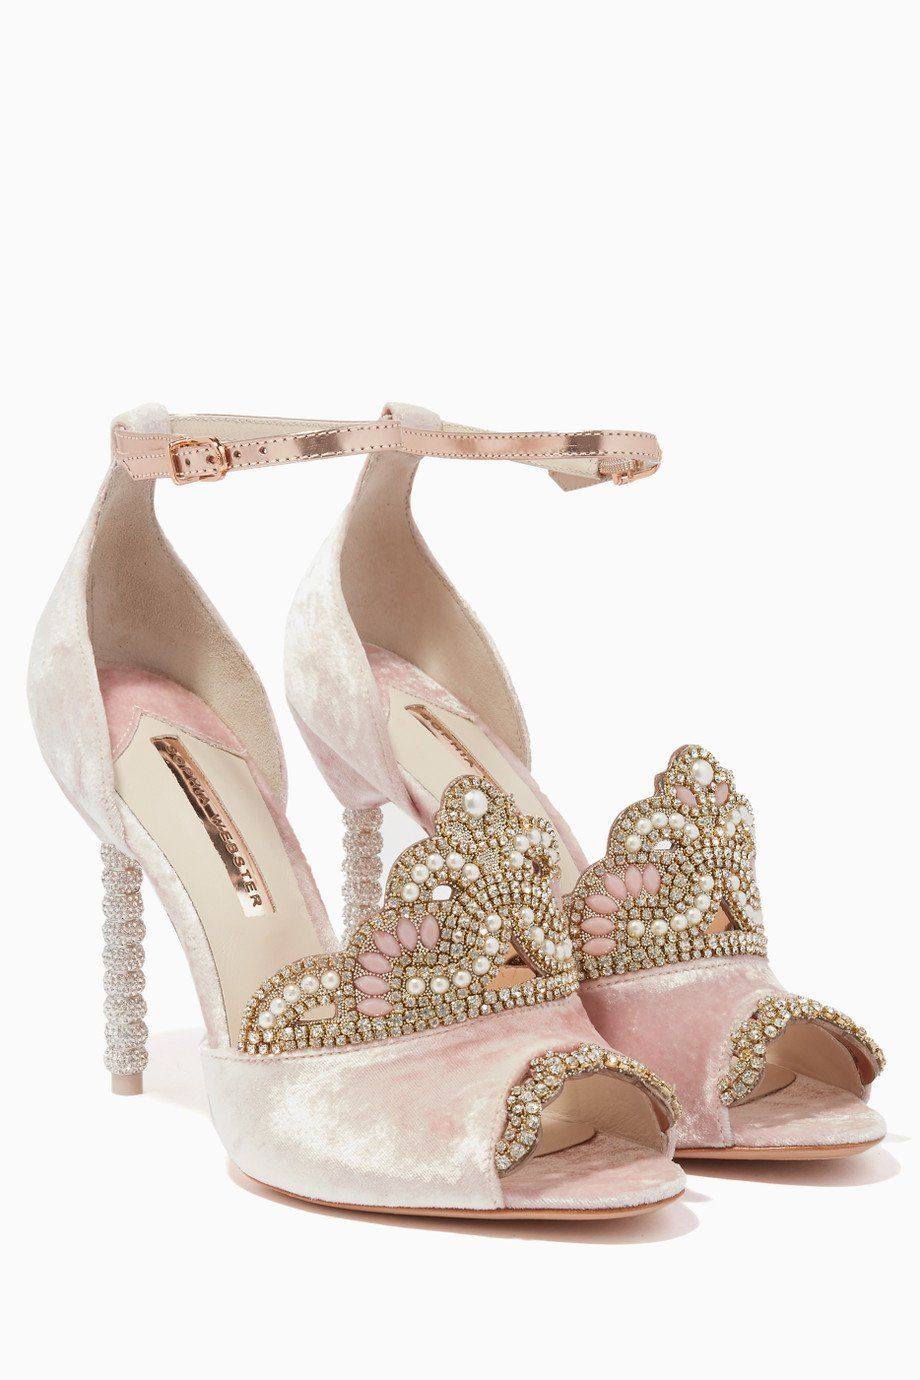 17db0094797b1 Shop Luxury Sophia Webster Pink Royalty Velvet & Crystal Tiara Sandals |  Ounass Kuwait